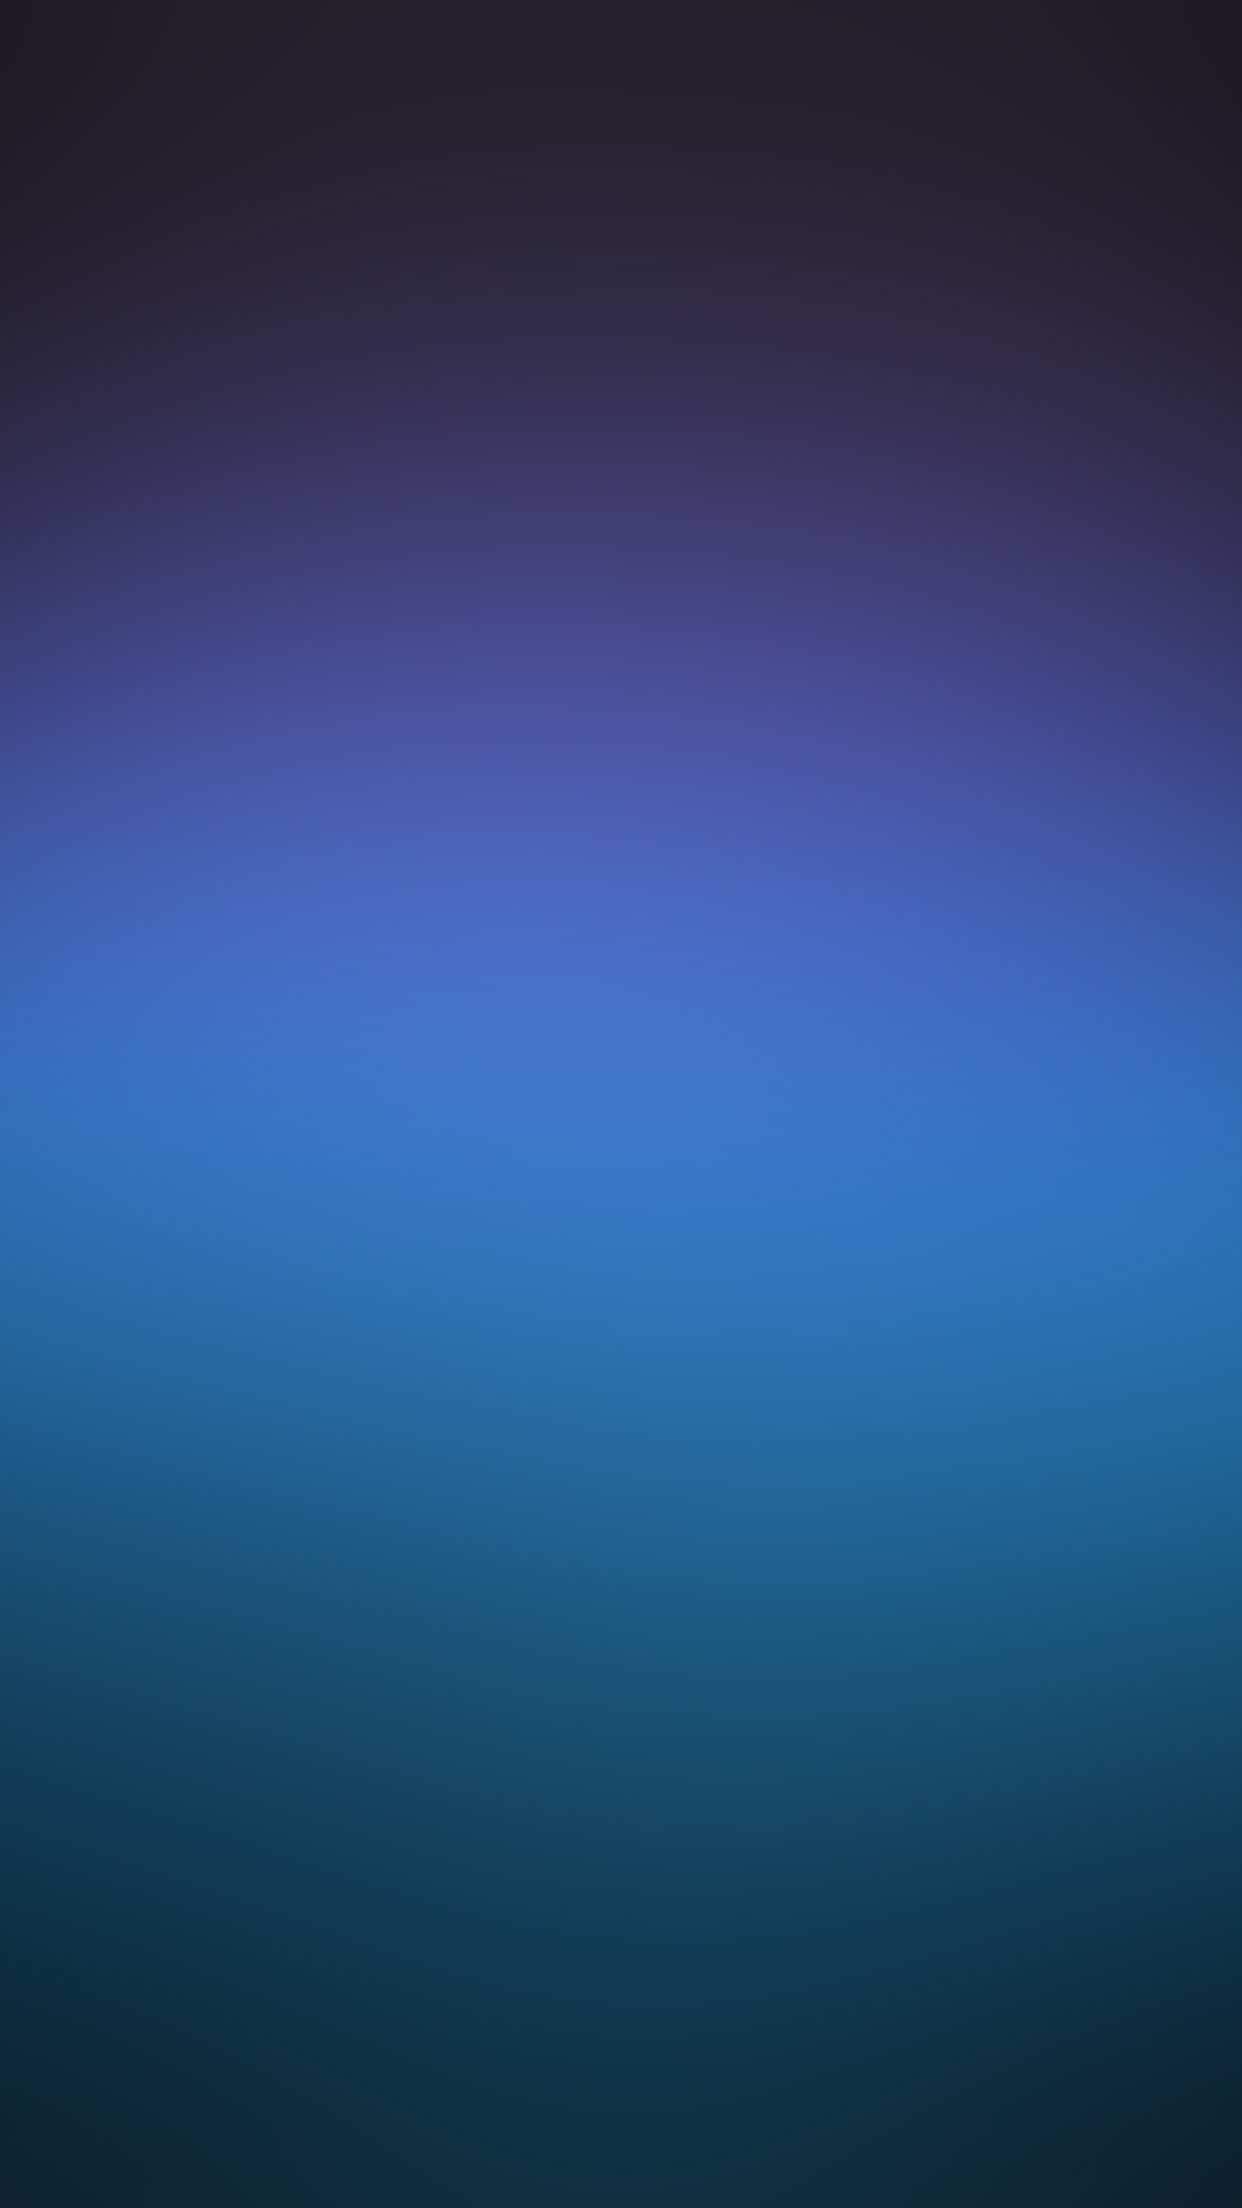 Papers Co Iphone Wallpaper Sm18 Blue Blur Gradation